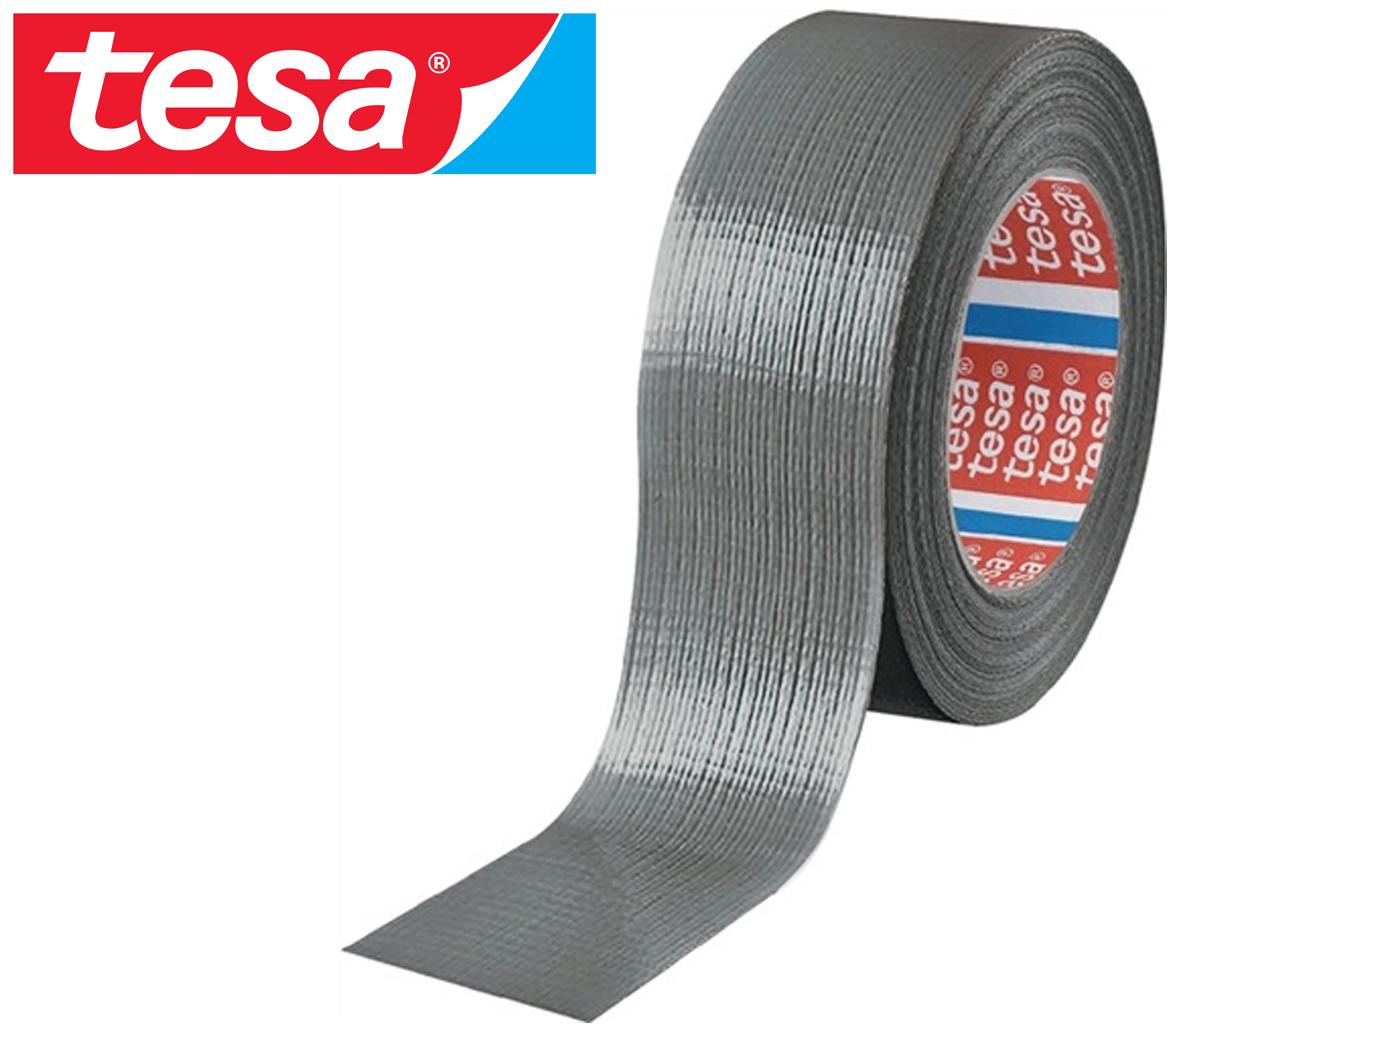 tape tesa 4662 lengte 50m B. 48mm zilver weefsel, PE-gecoat rl TESA